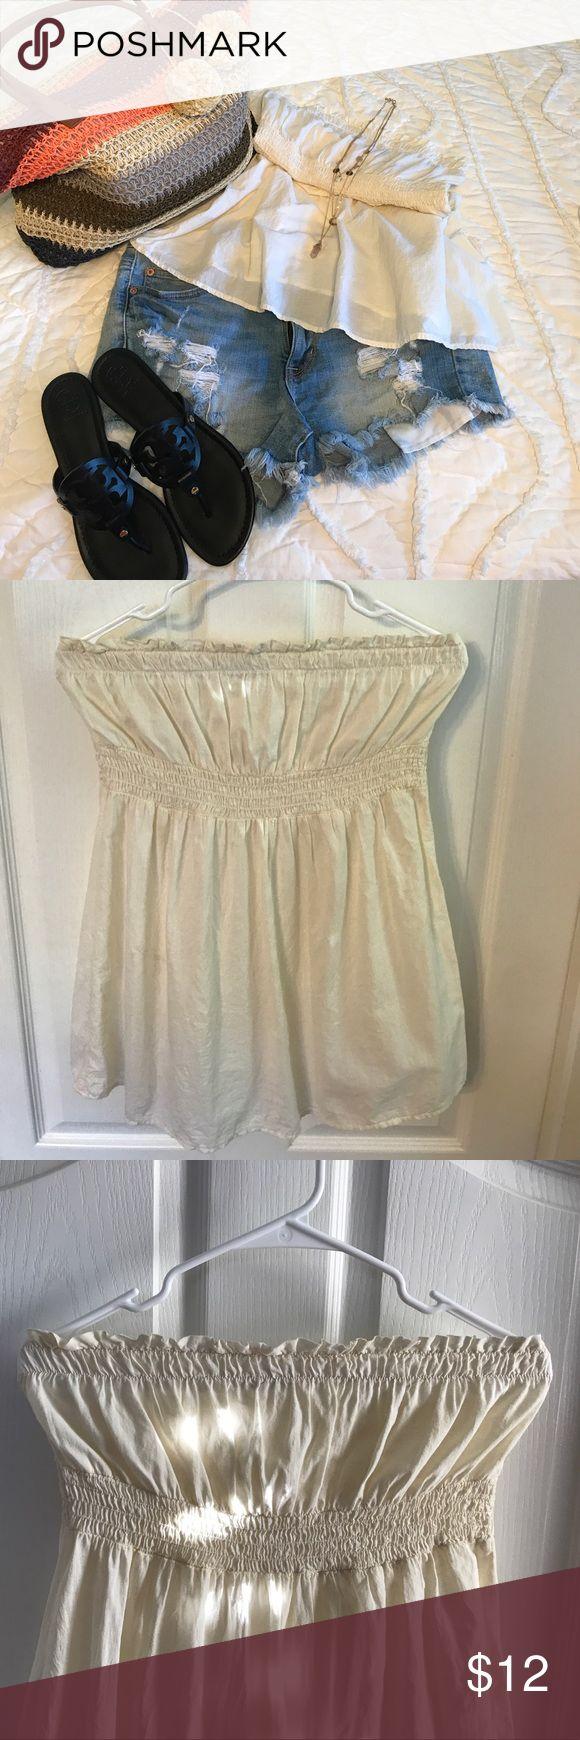 "Cute feminine bandeau top.. Elastic w/ ruffle edge at top.. elastic waist & back..   summery & lightweight 23"" long. Darling w/ denim shorts & cute summer sandals.. heritage Tops"